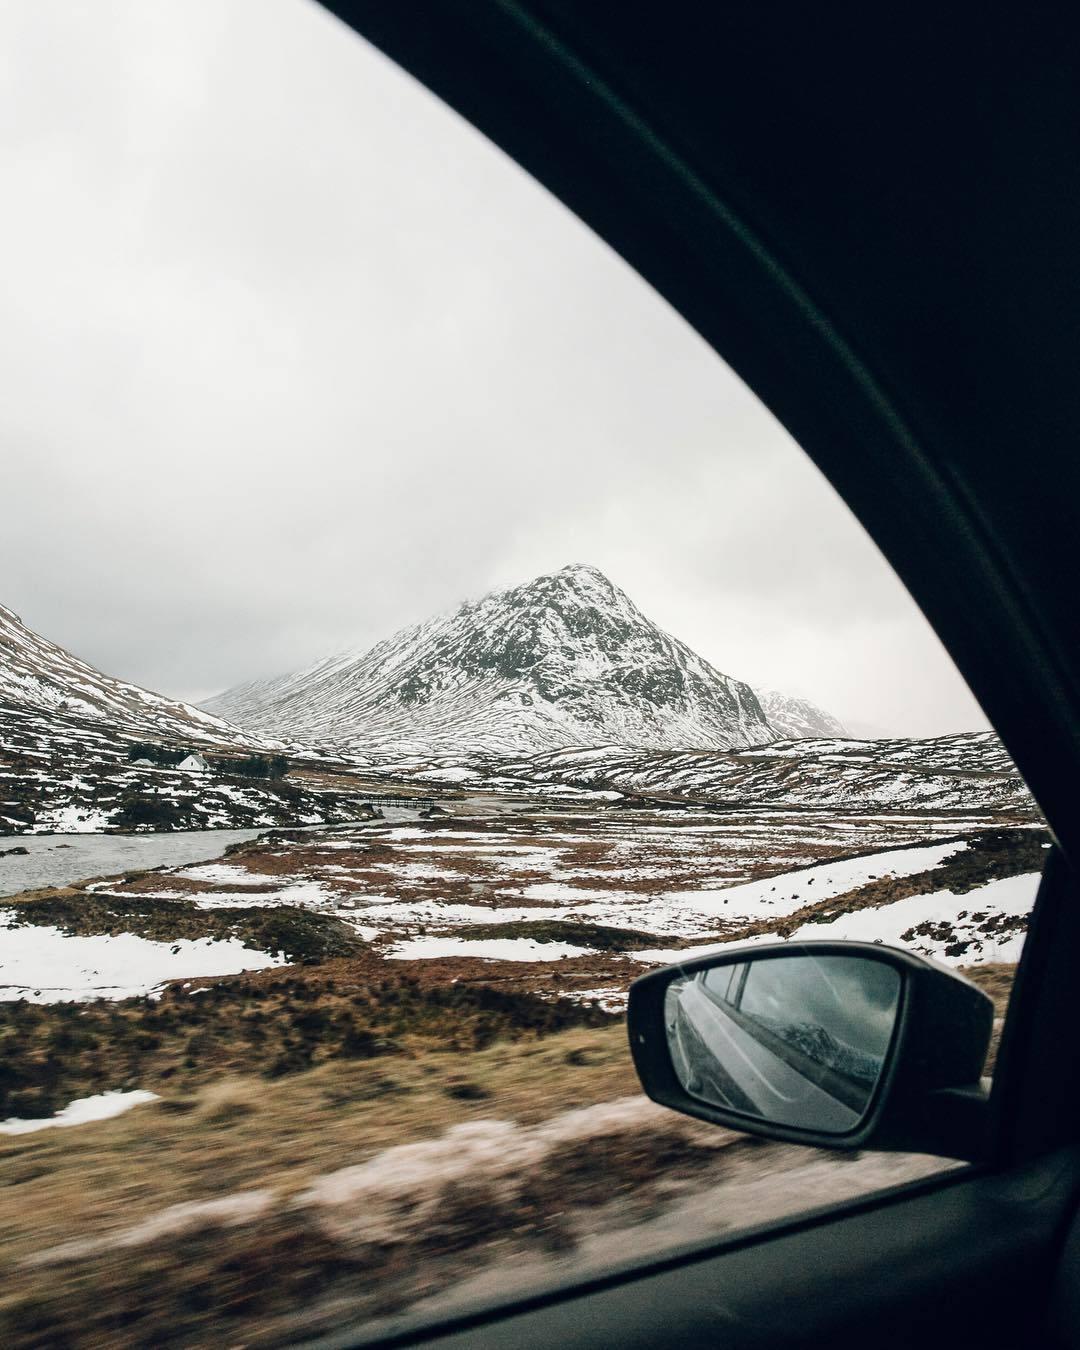 mountain scene from car window